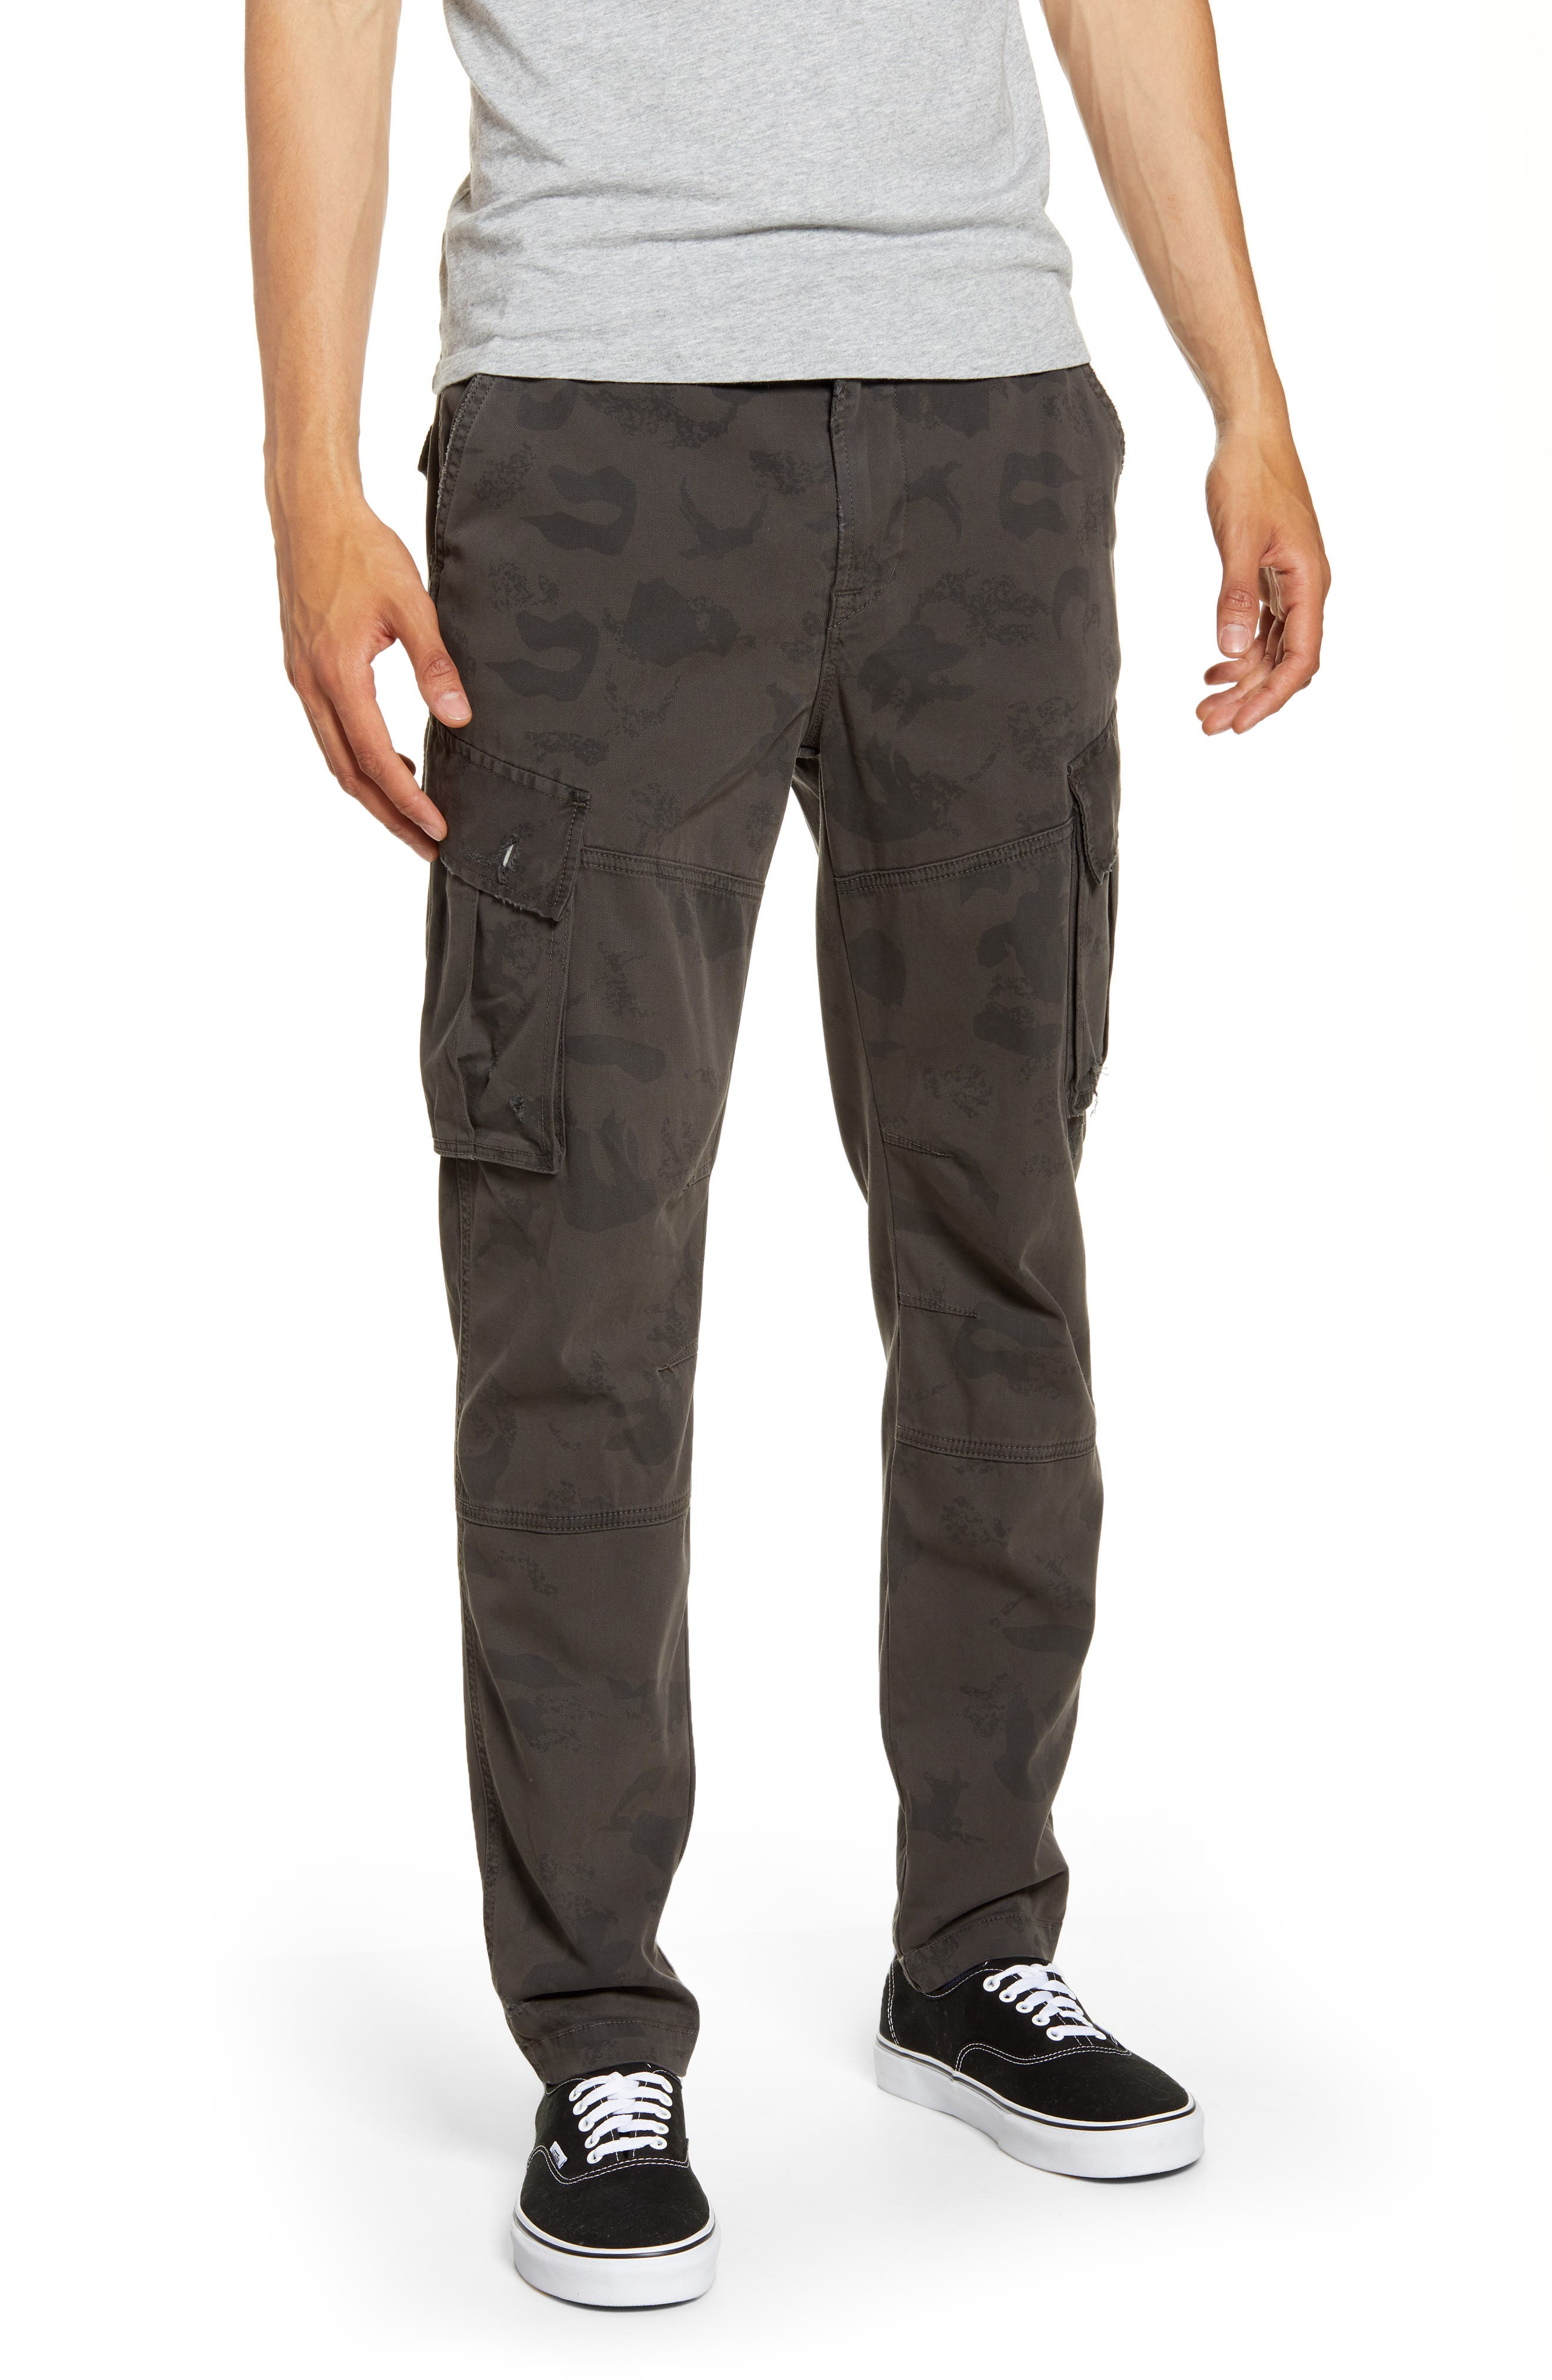 Hudson Jeans Skinny Fit Cargo Pants, Grey